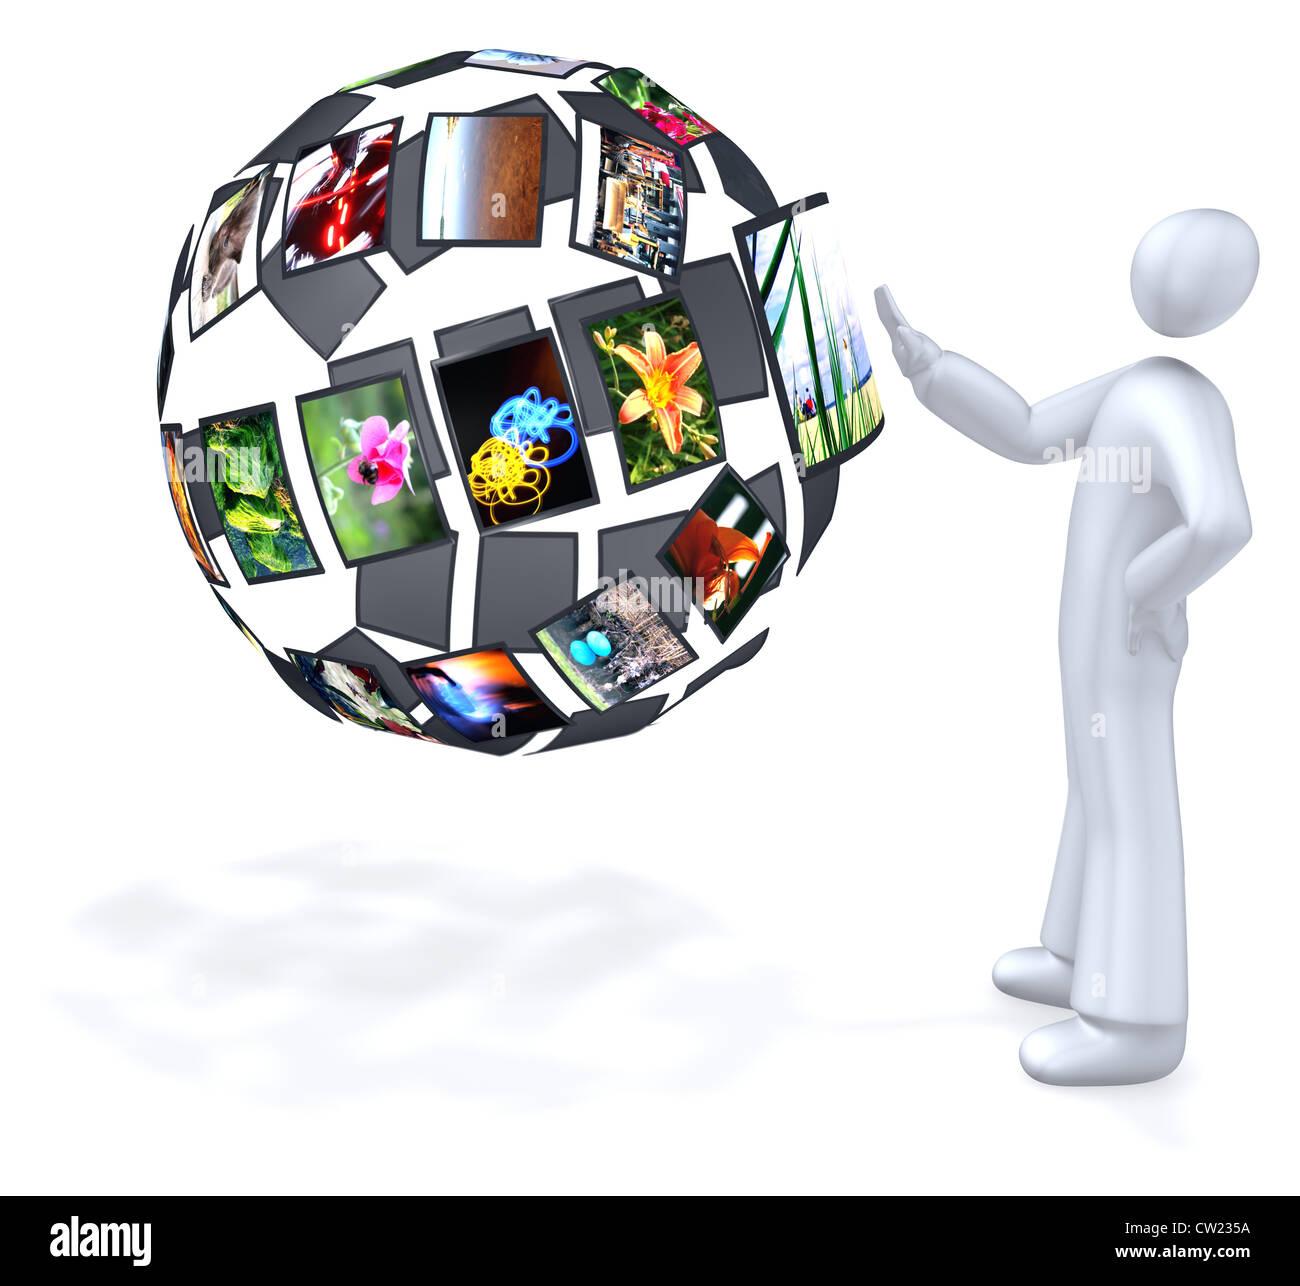 Futuristic 3D user interface - Stock Image